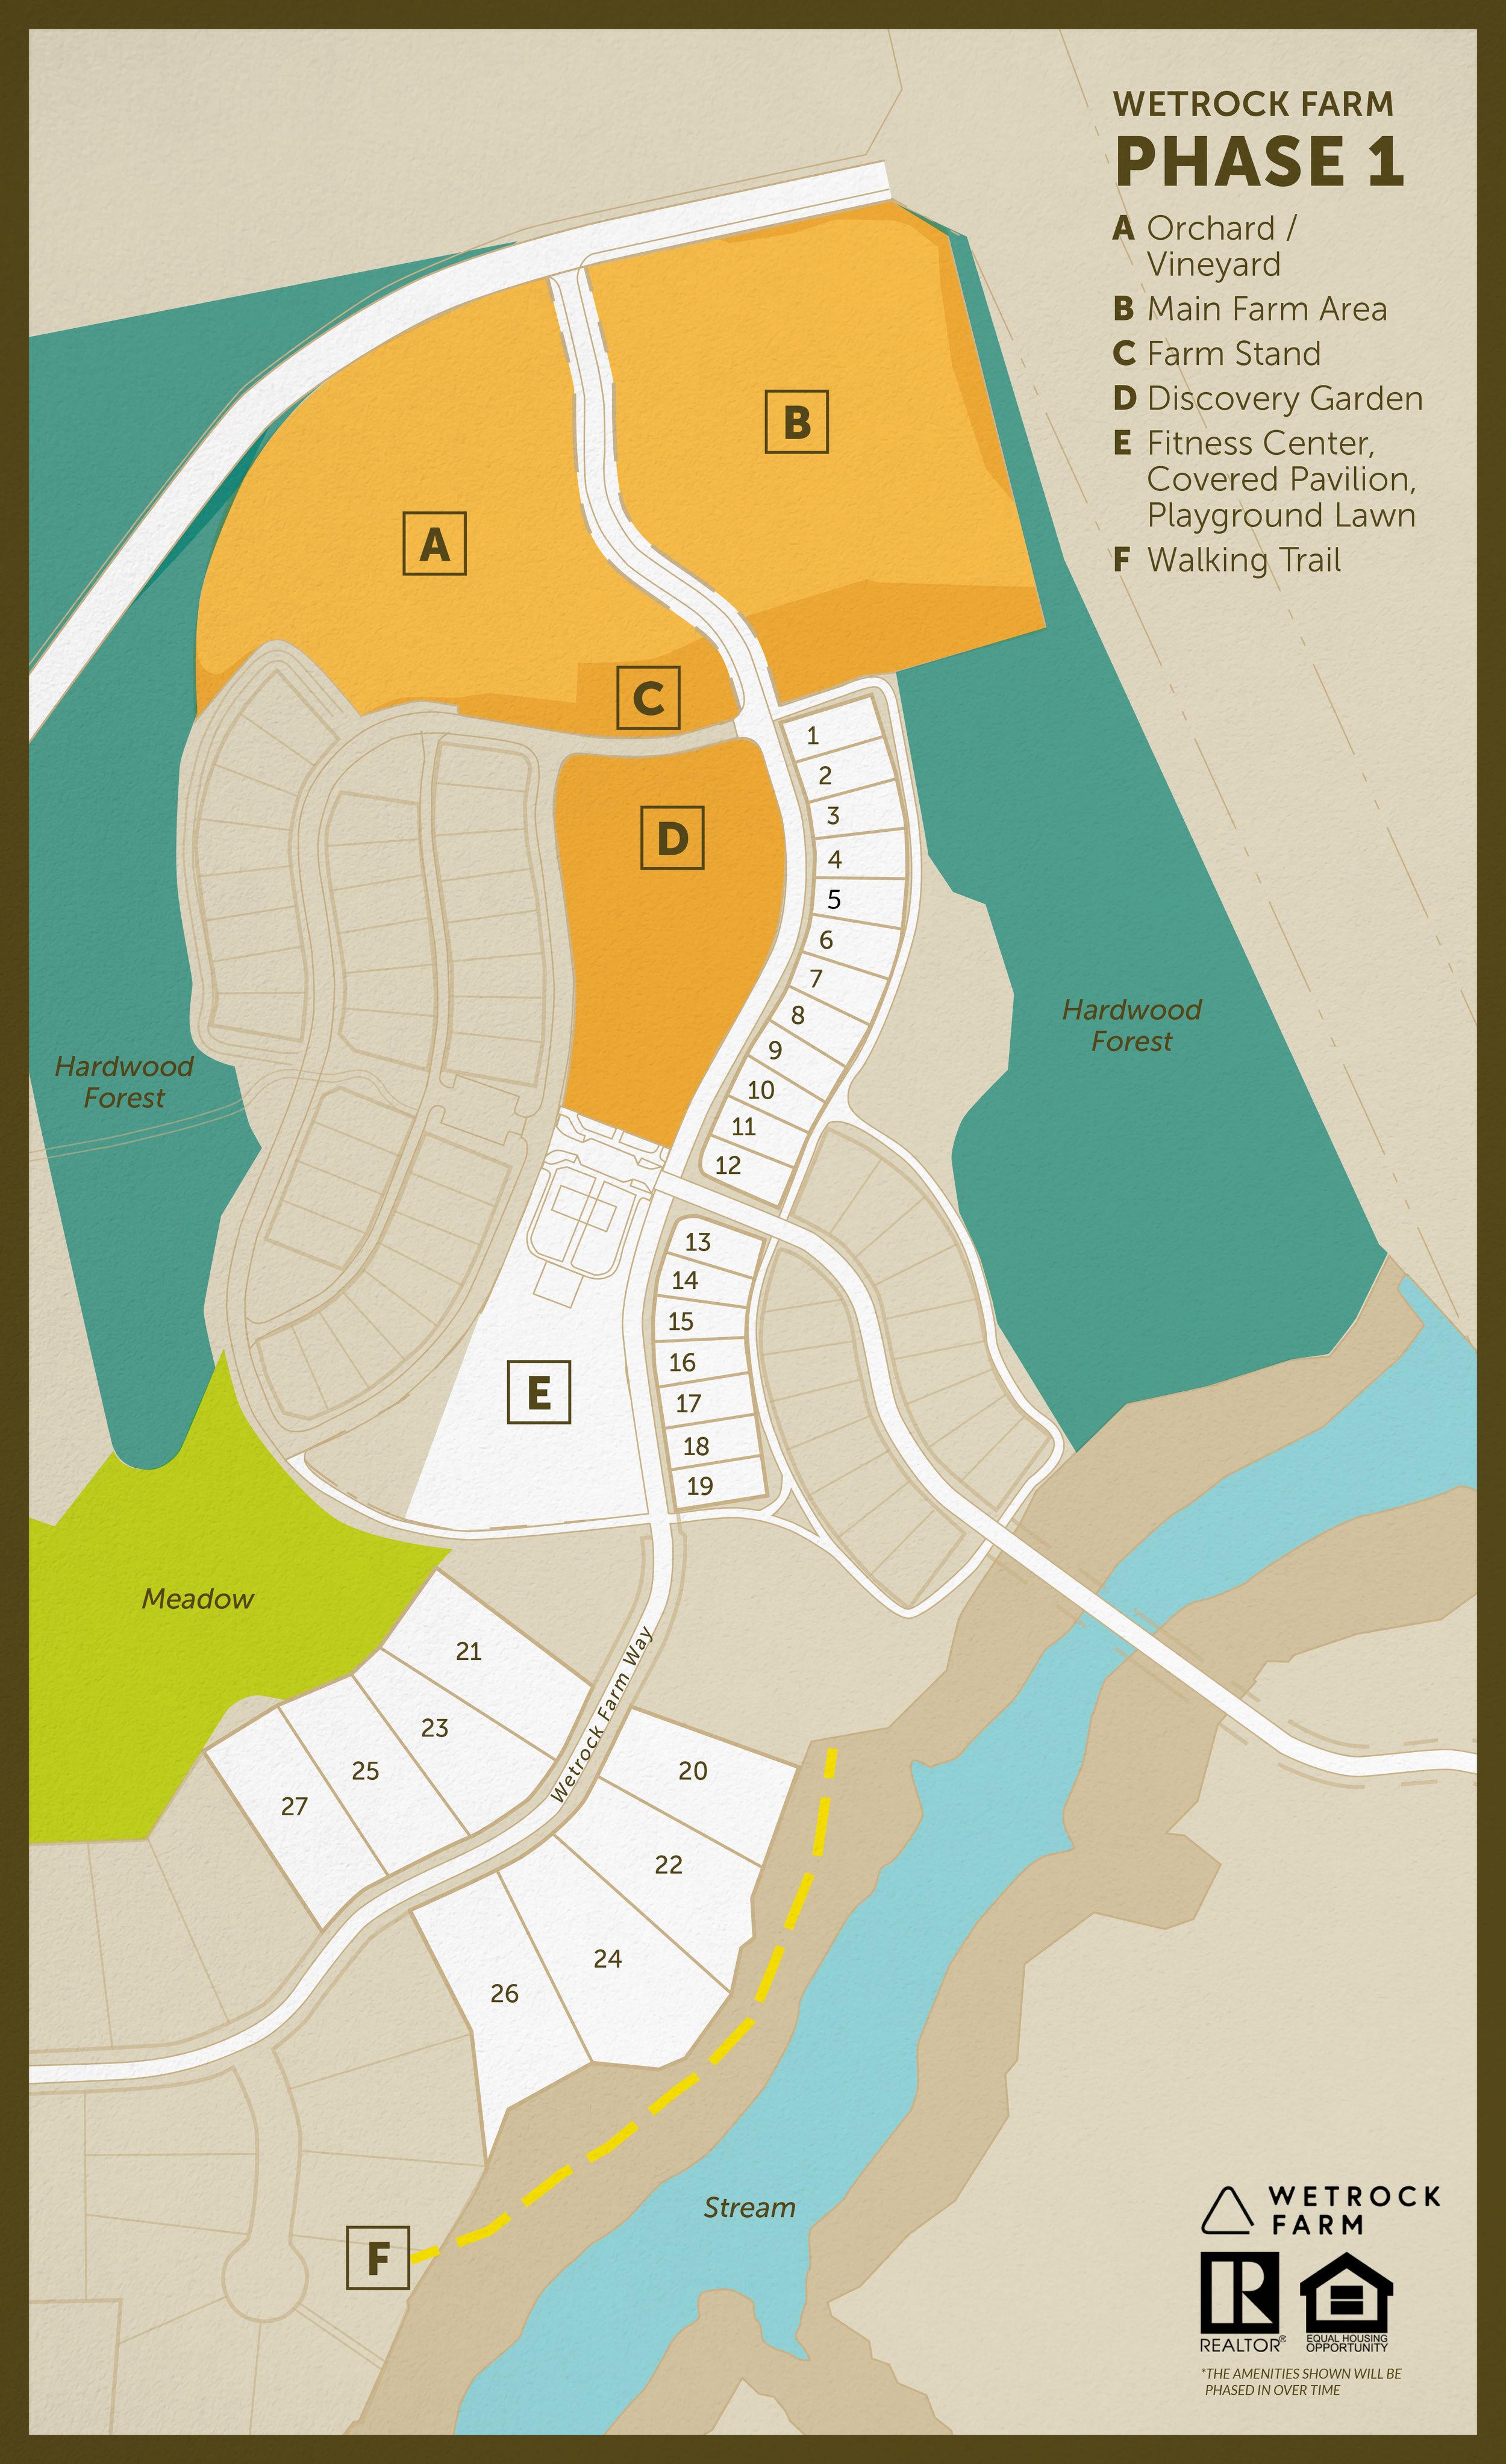 Wetrock Farm Homes Lot Map 2019